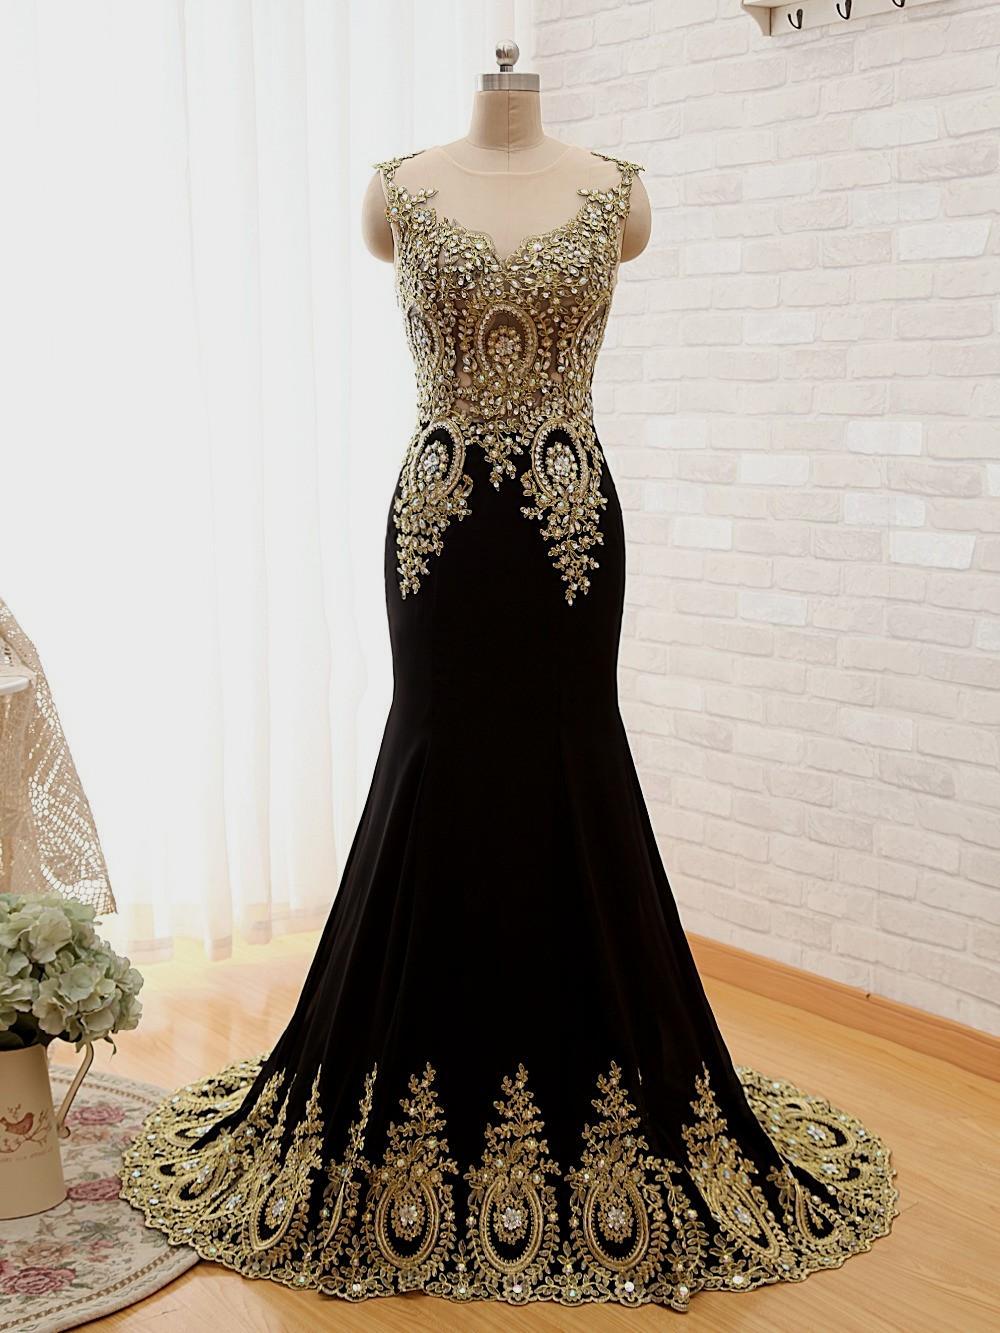 Gold And Black Lace Long Dress Www Pixshark Com Images